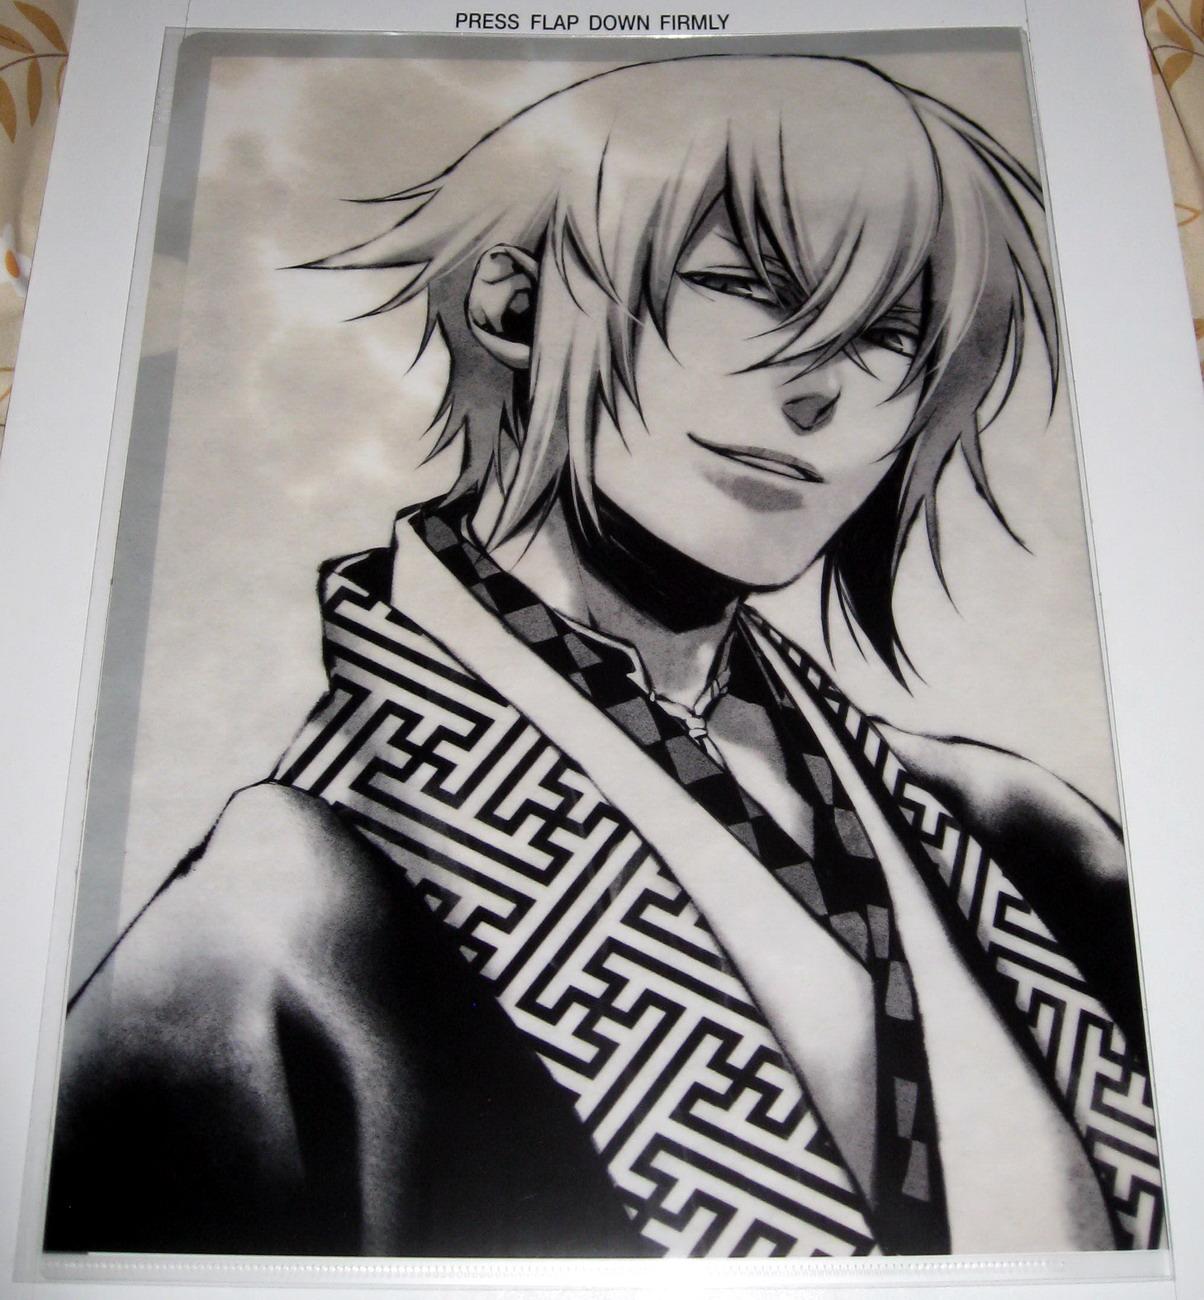 Hakuouki CF - 0913 Sketch Kazama